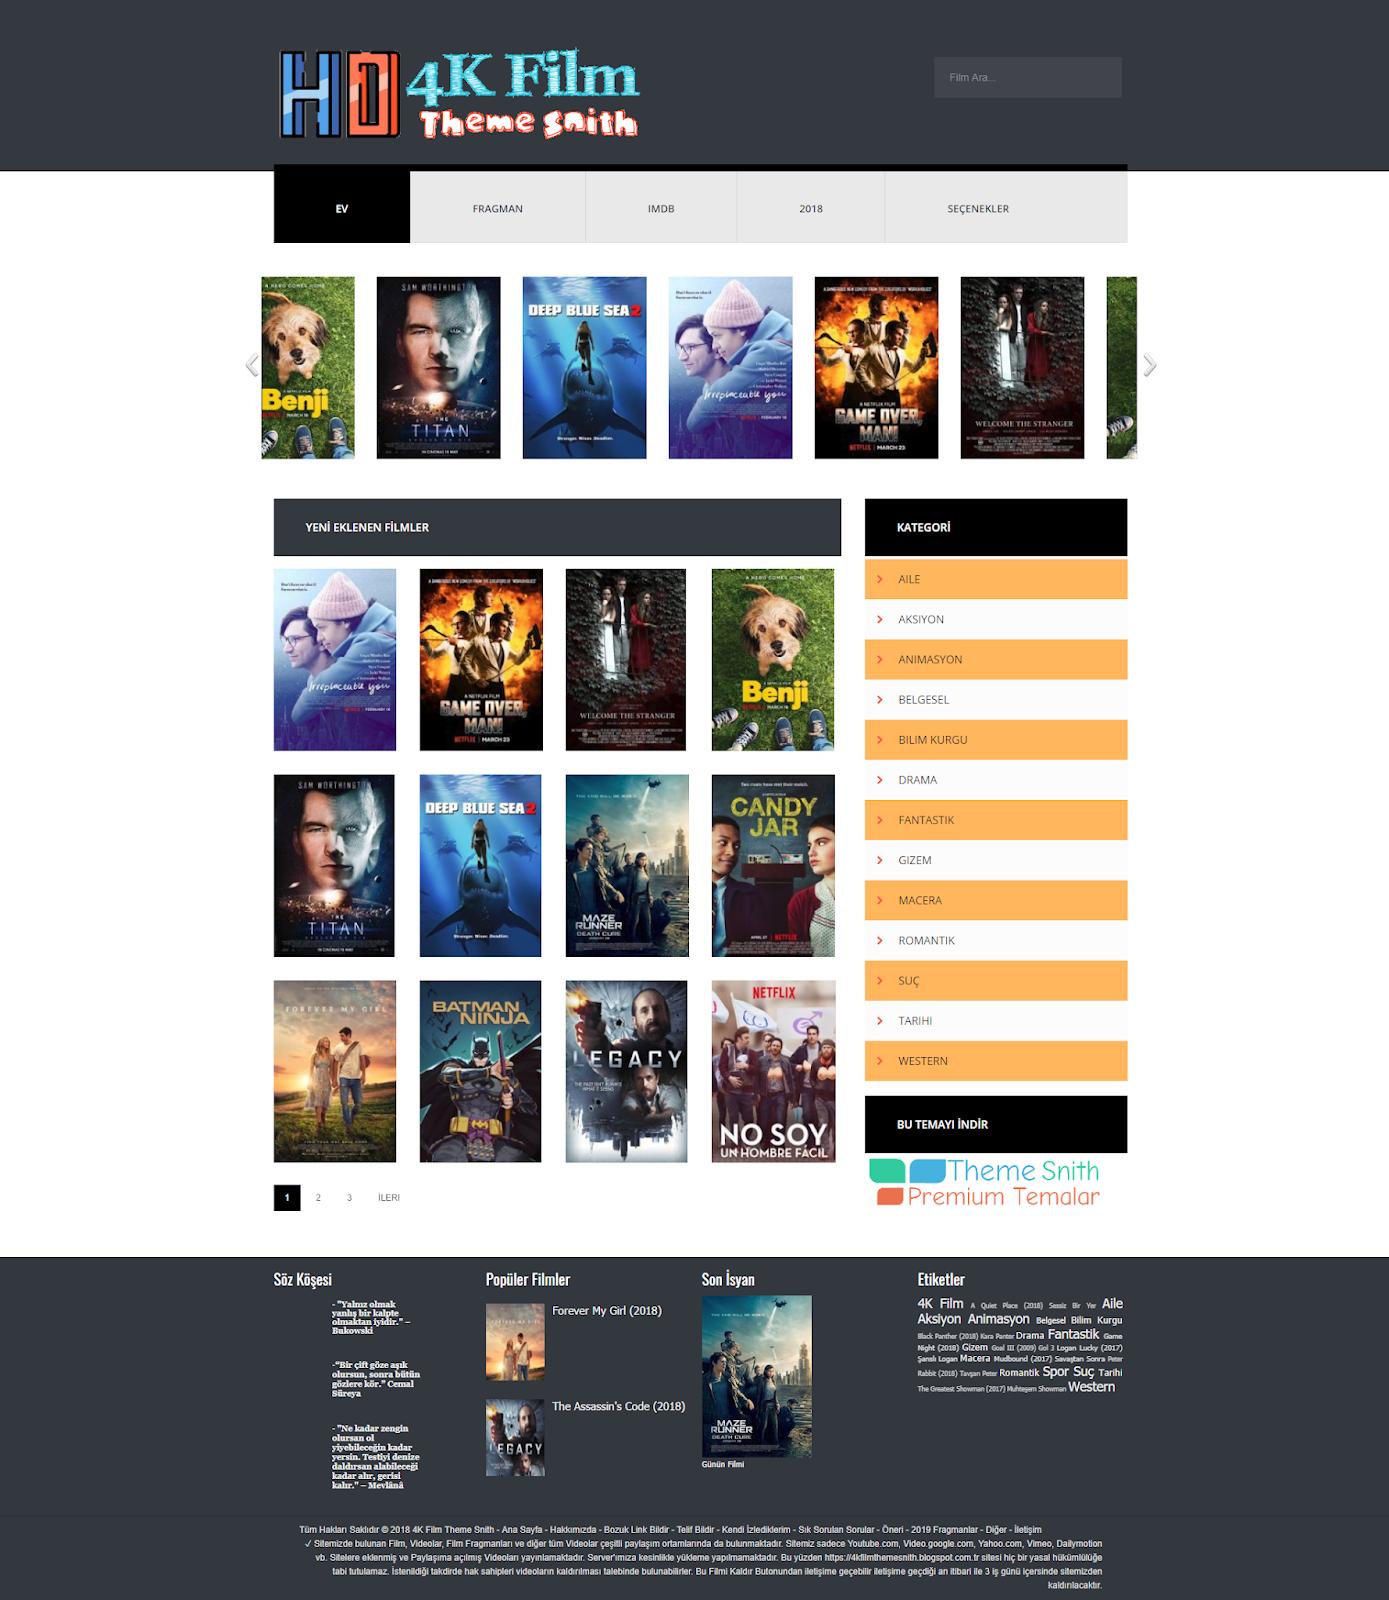 4K+Film+Theme+Snith+++Film+Blog%2527u.pn